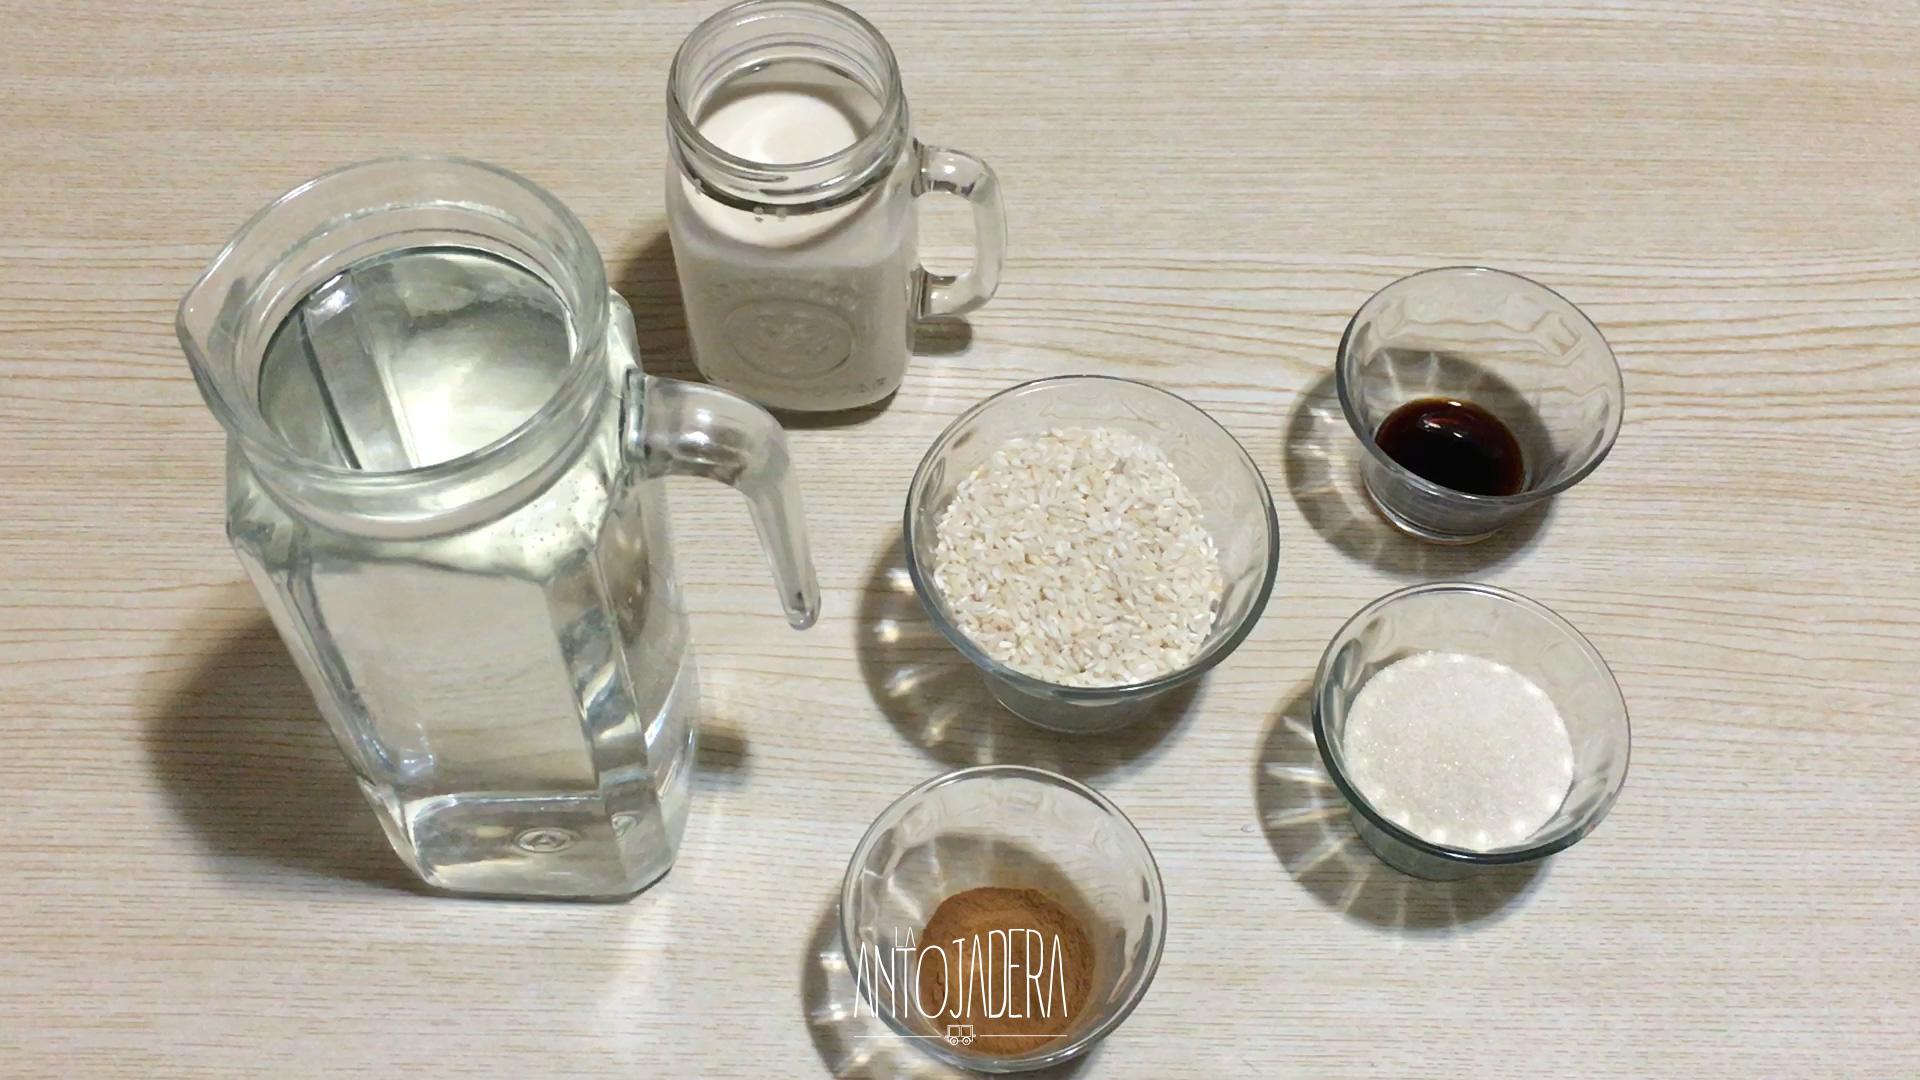 La Antojadera | Agua de Horchata con Arroz